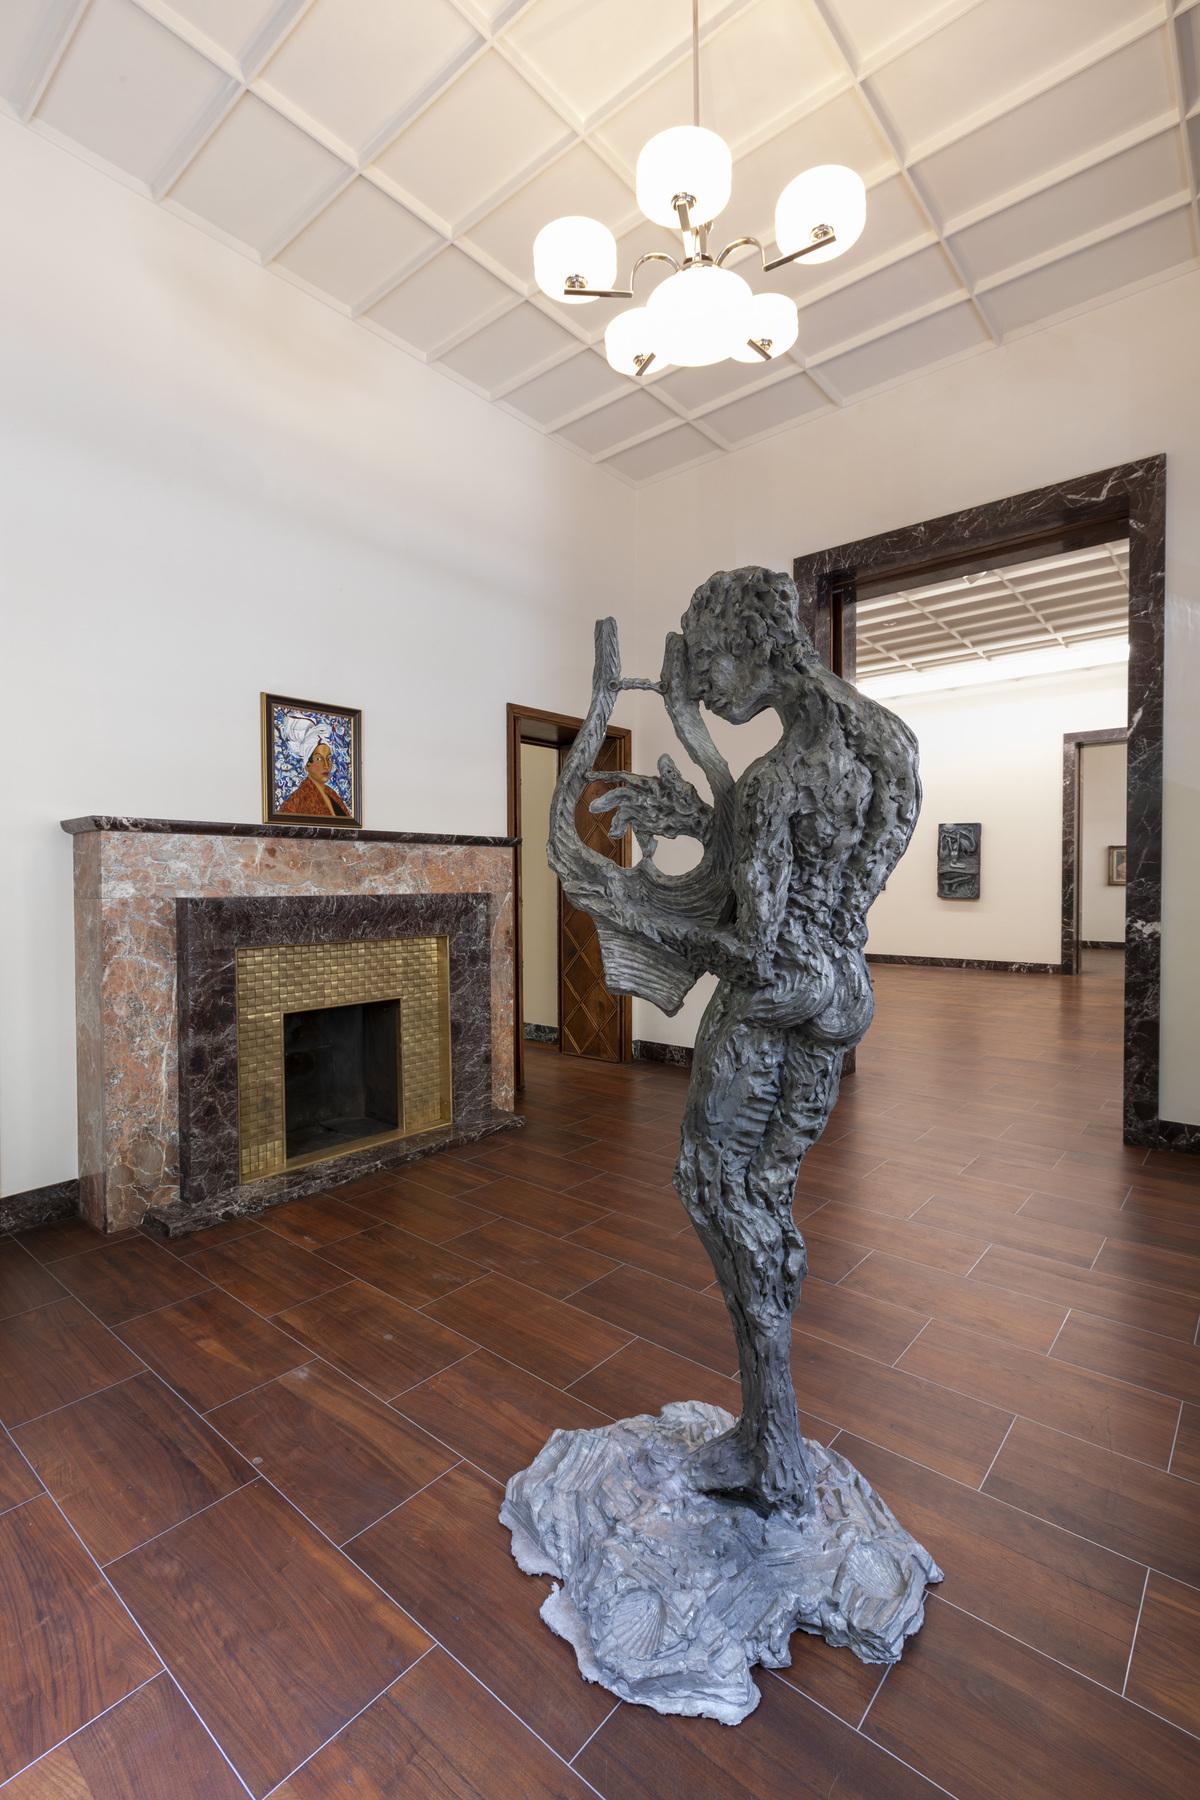 Portraiture One Century Apart, MASSIMODECARLO Milano, Installation Views by Roberto Marossi Courtesy MASSIMODECARLO